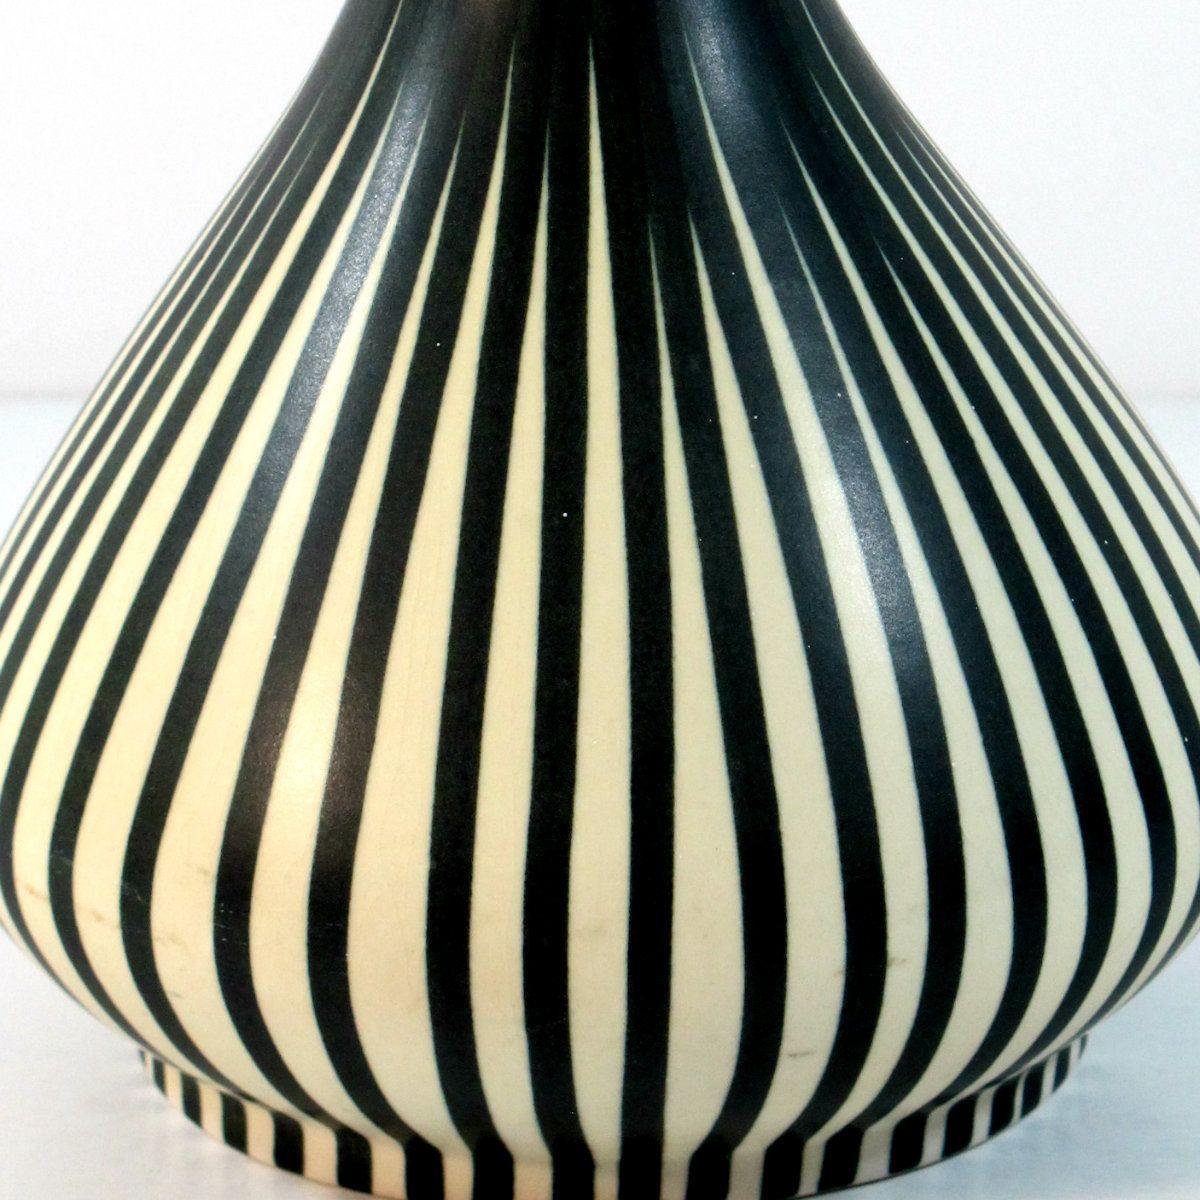 Ceramic vase by maria kohler for villeroy boch 1960s for sale ceramic vase by maria kohler for villeroy boch 1960s reviewsmspy